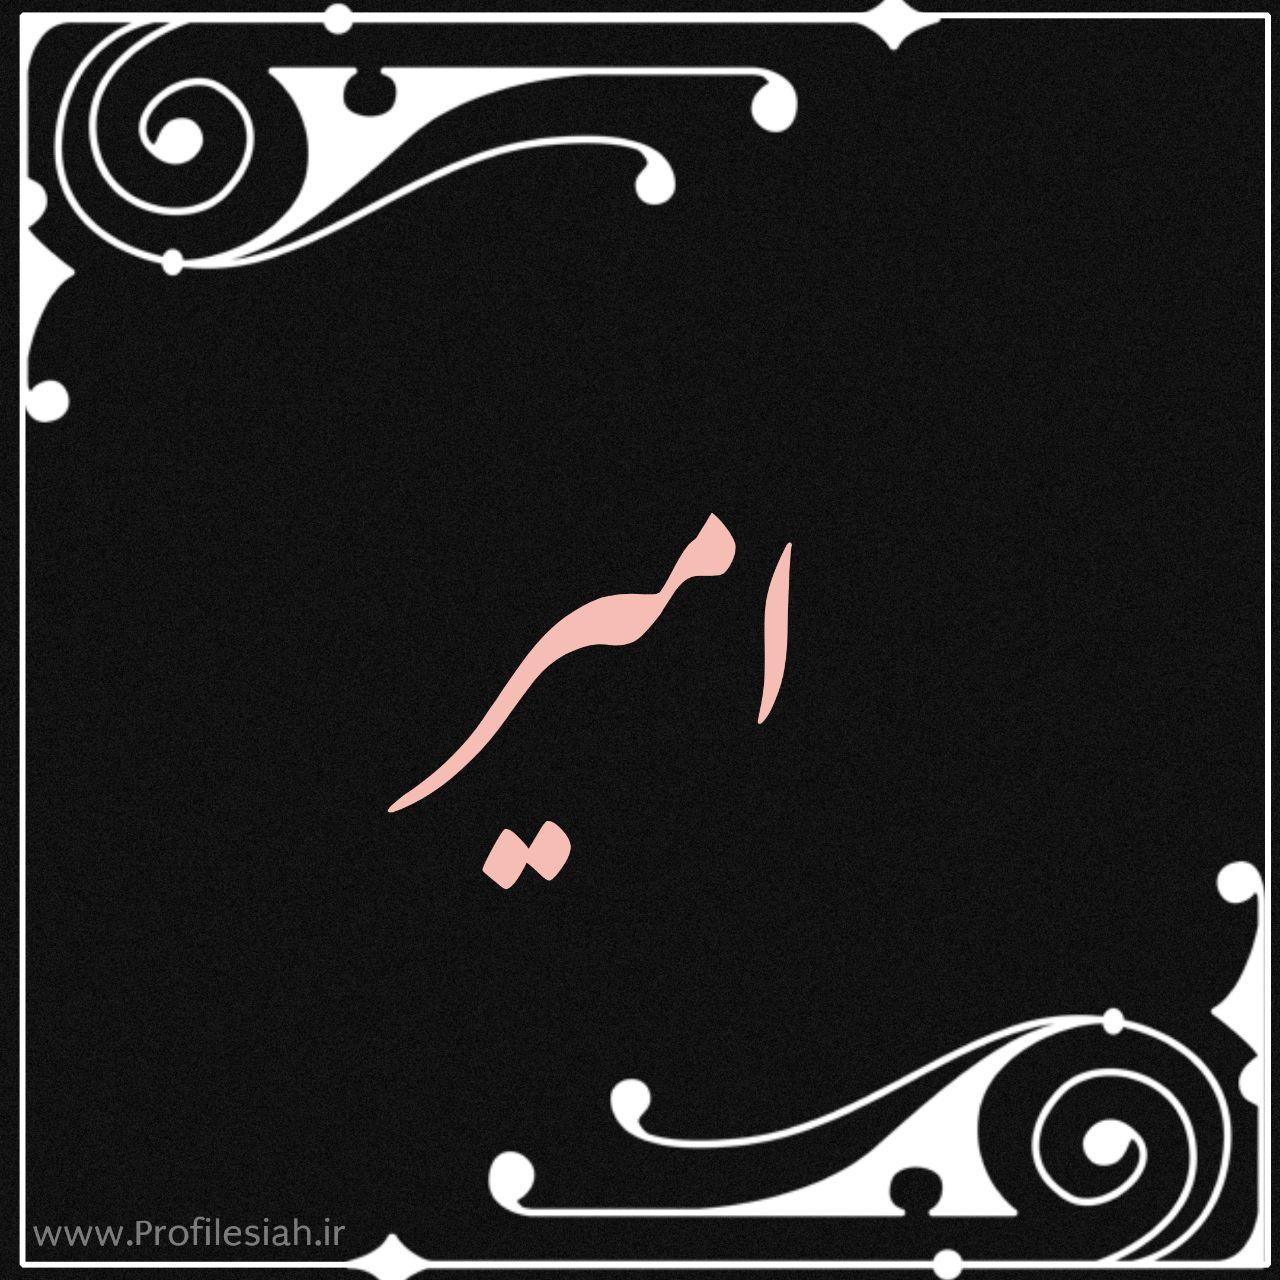 لوگو و عکس نوشته ی اسم امیر